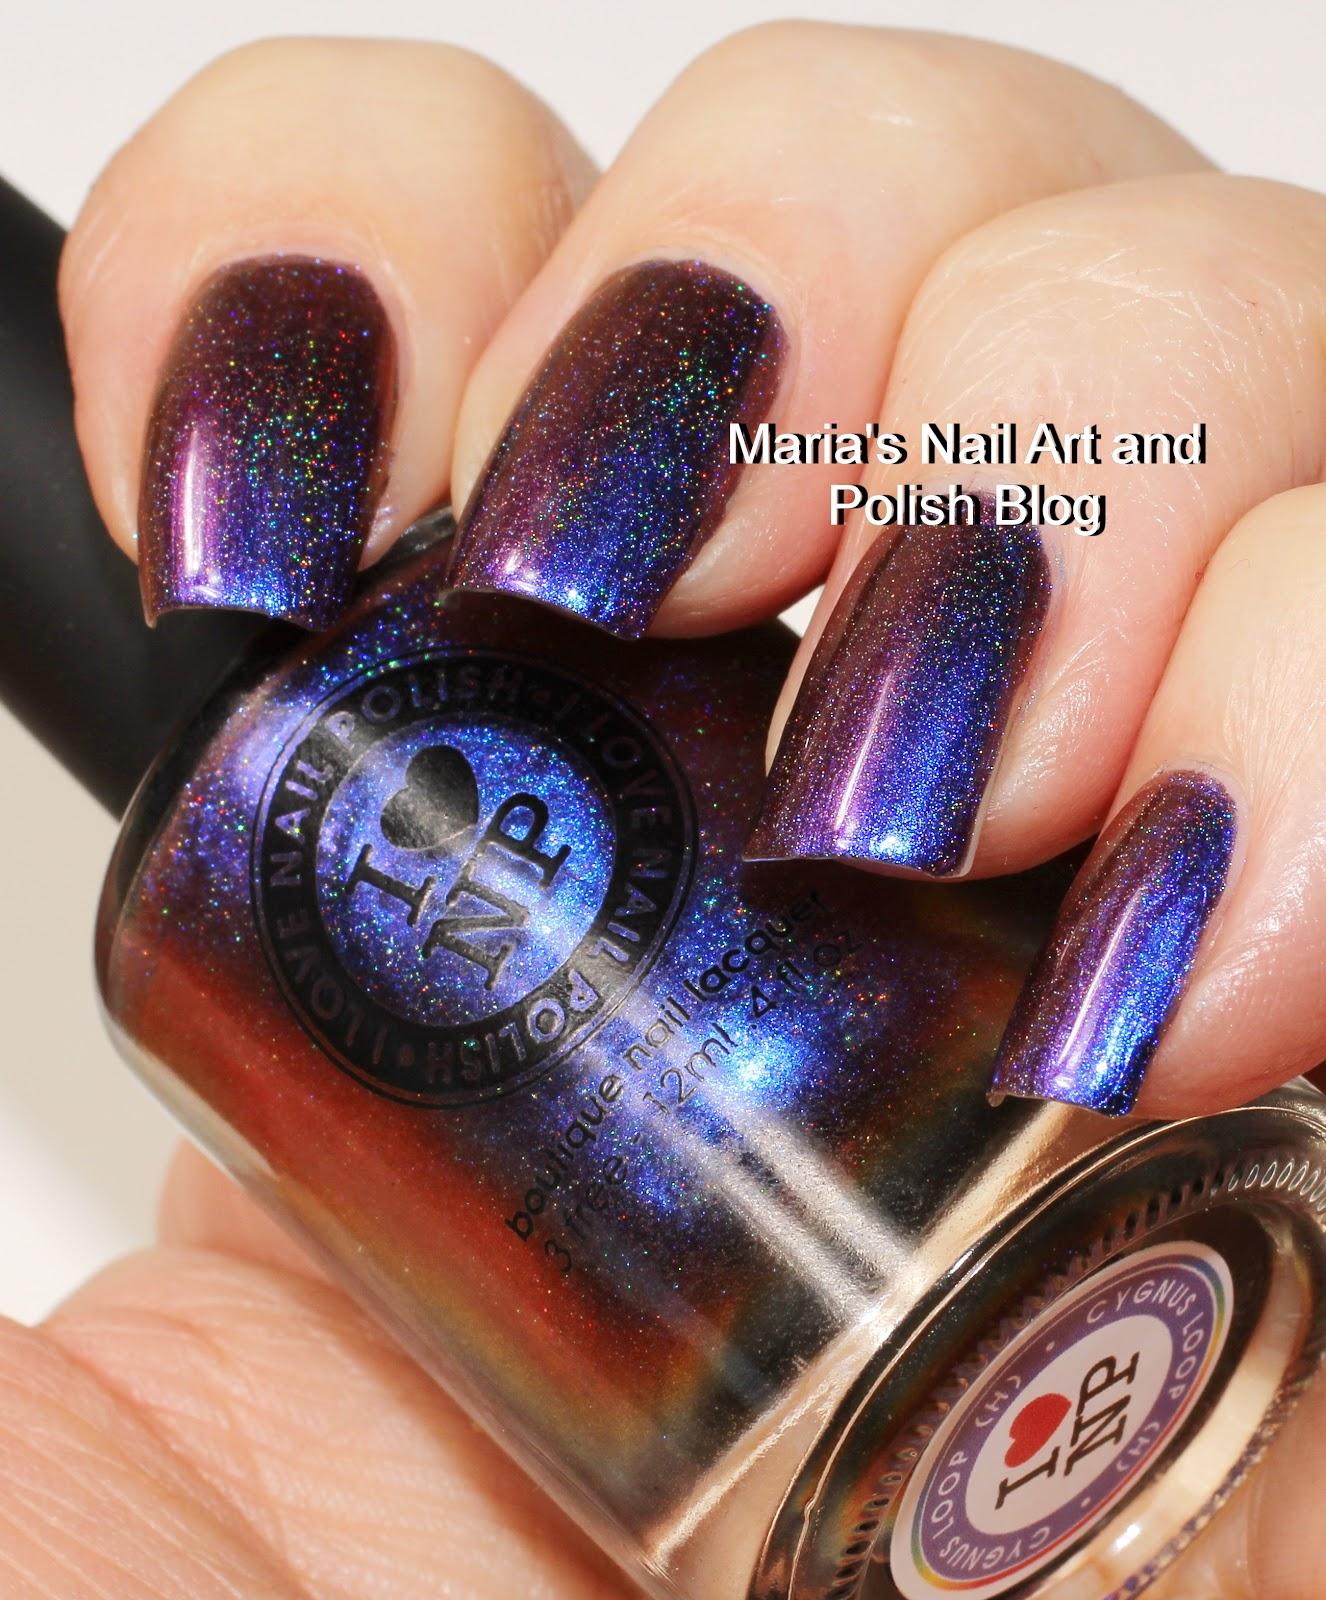 Marias Nail Art And Polish Blog: ILNP Birefringence (H